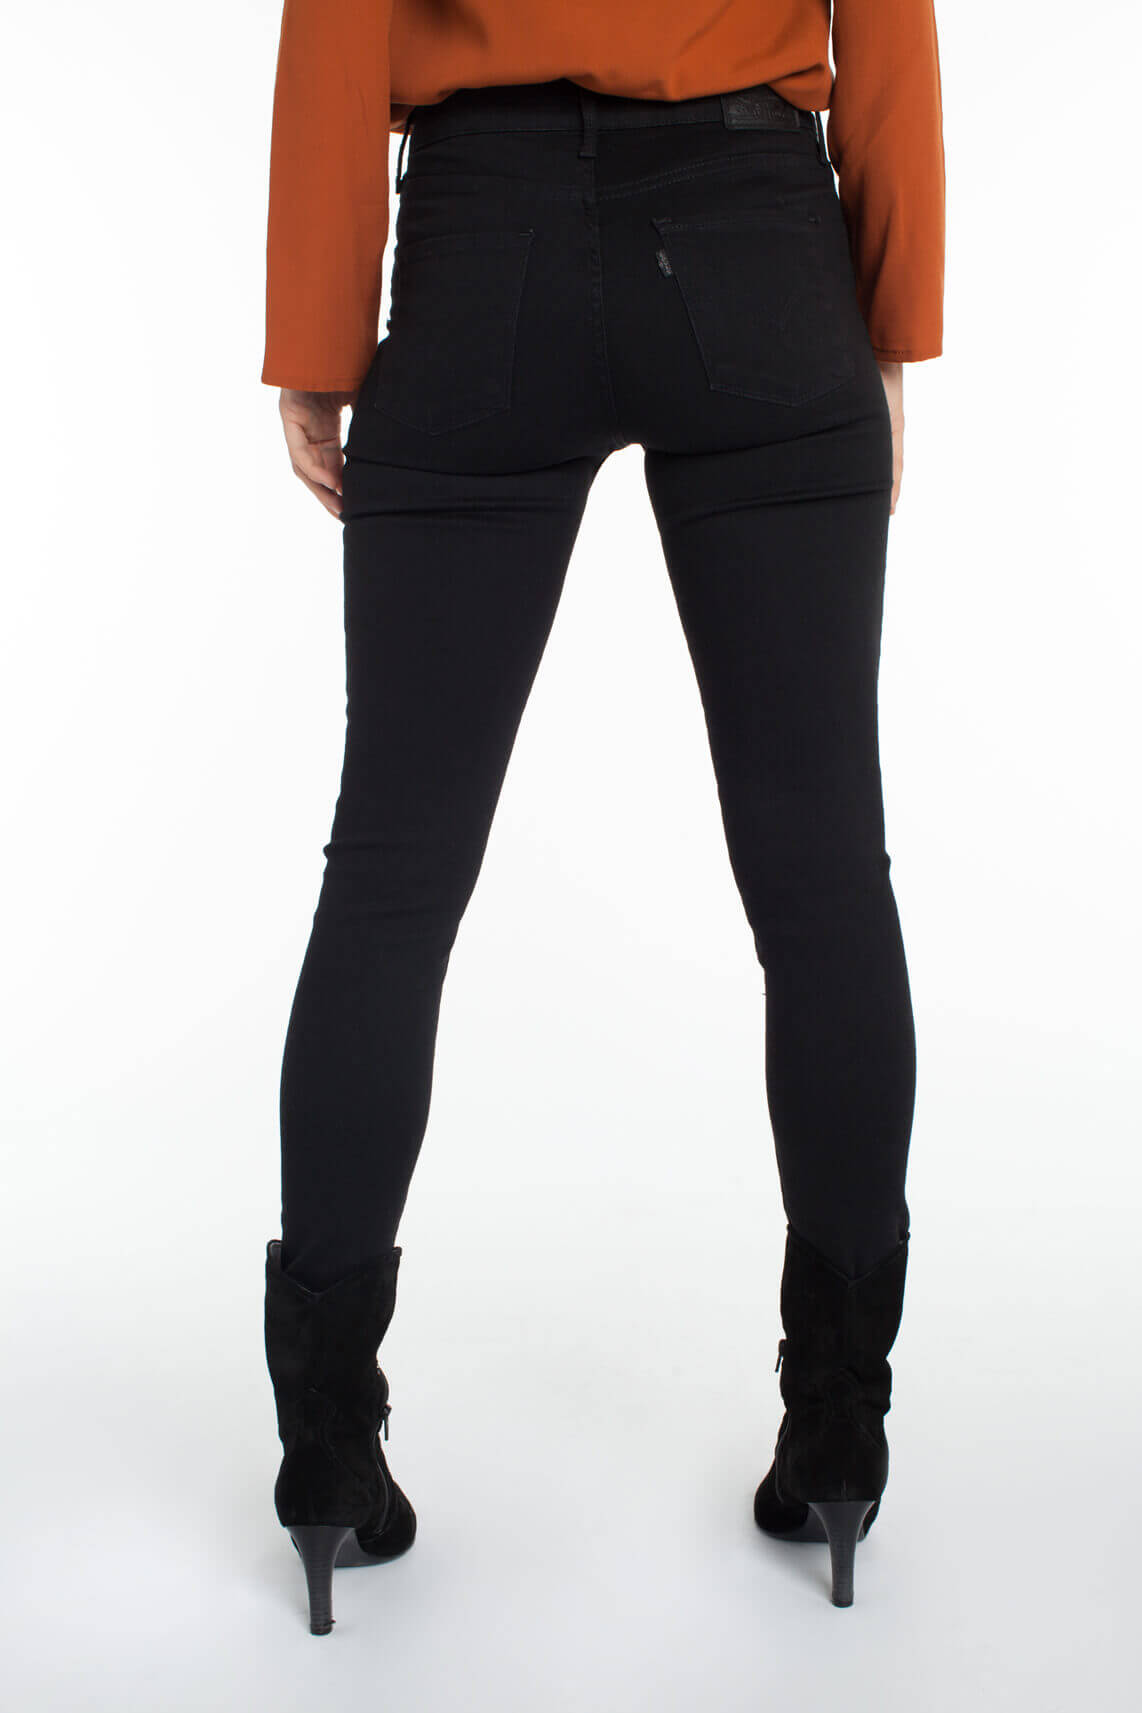 Levi's Dames 310 shaping super skinny jeans Zwart